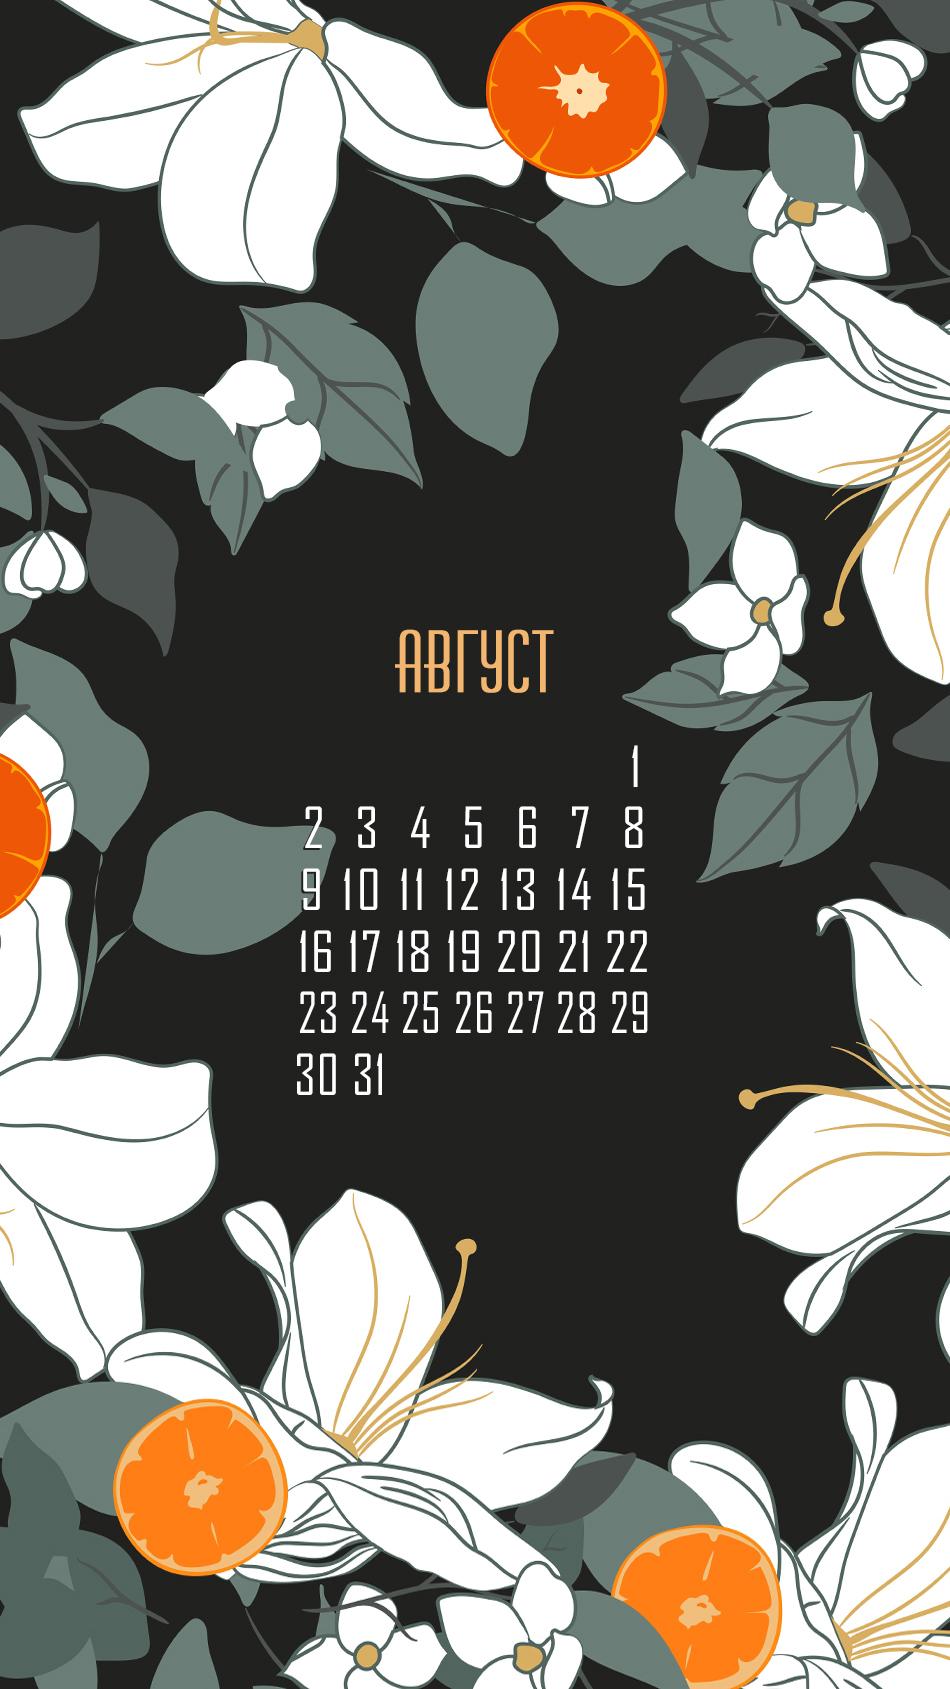 календарь на август 6 district-f.org